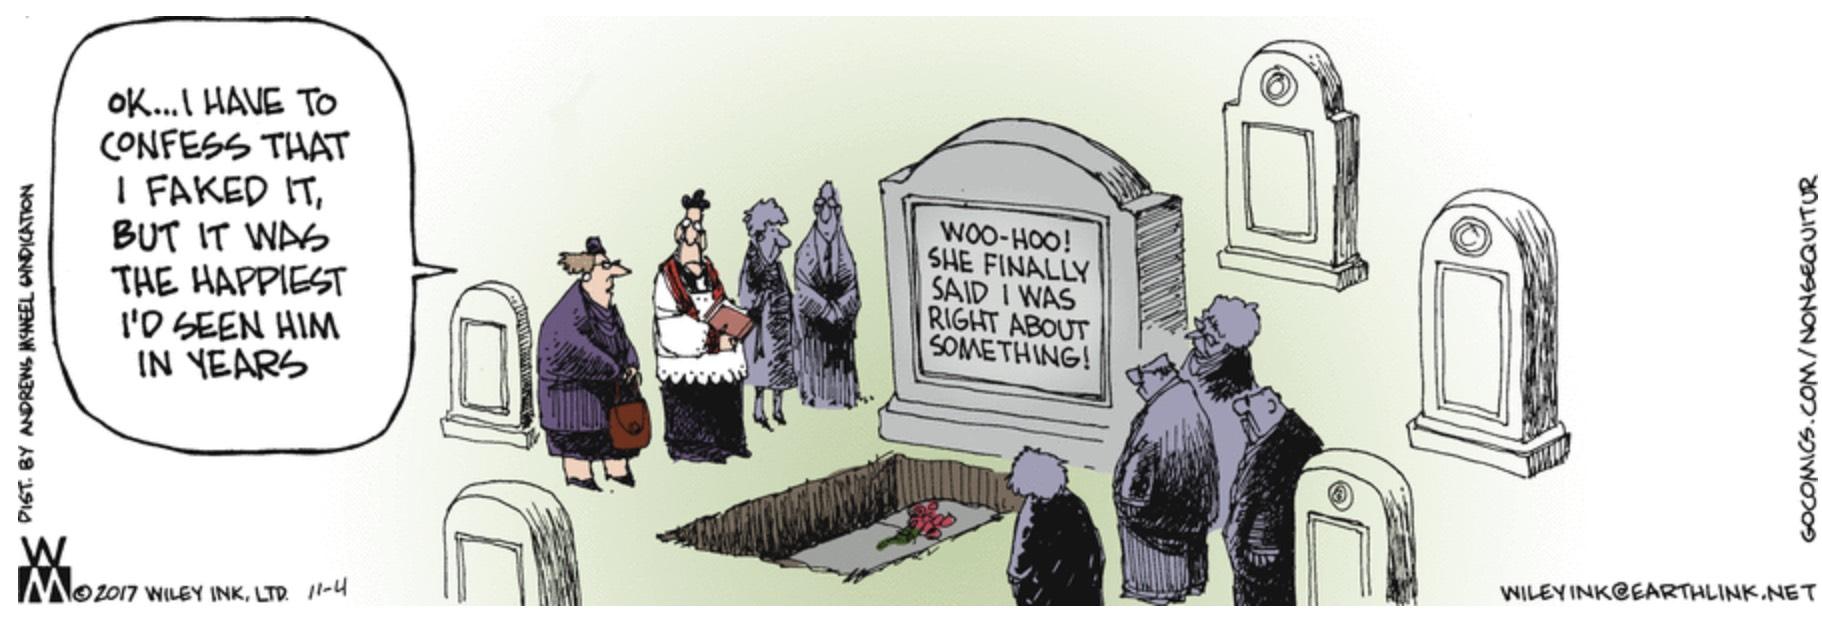 Non Sequitur cemetery headstone